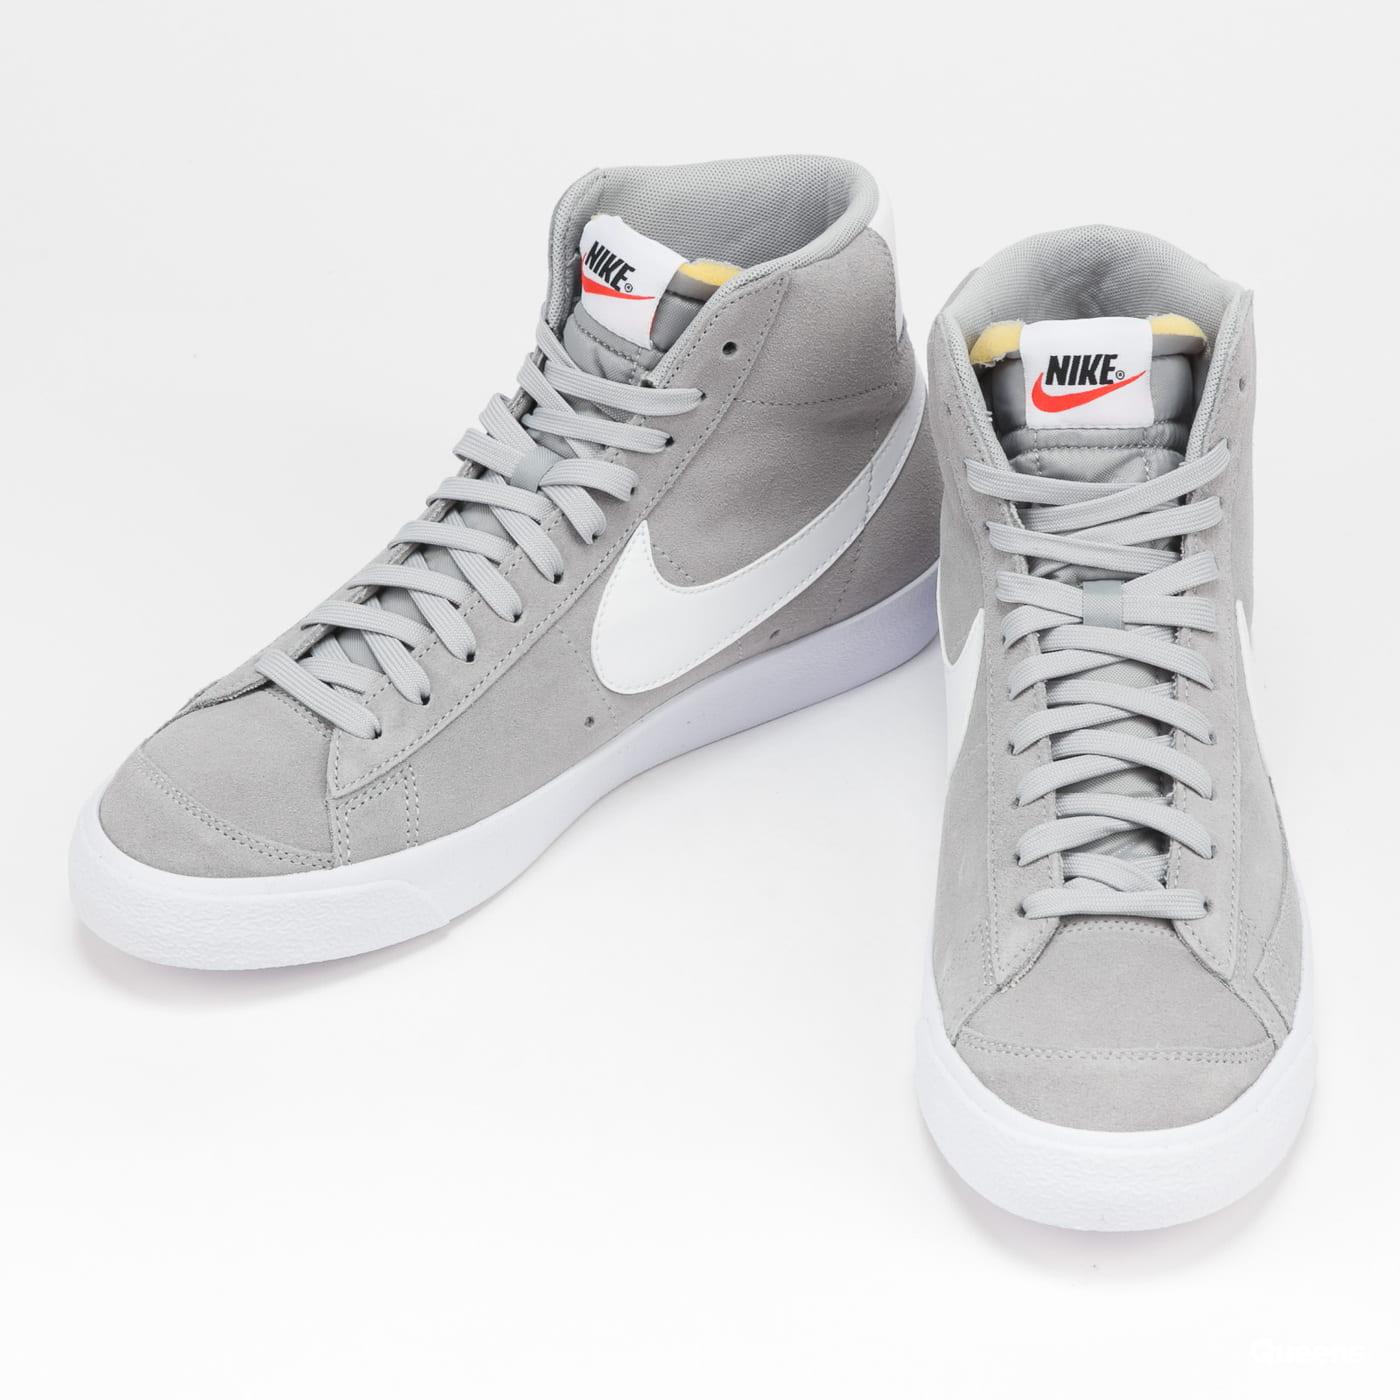 Nike Blazer Mid '77 Suede lt smoke grey / white - white